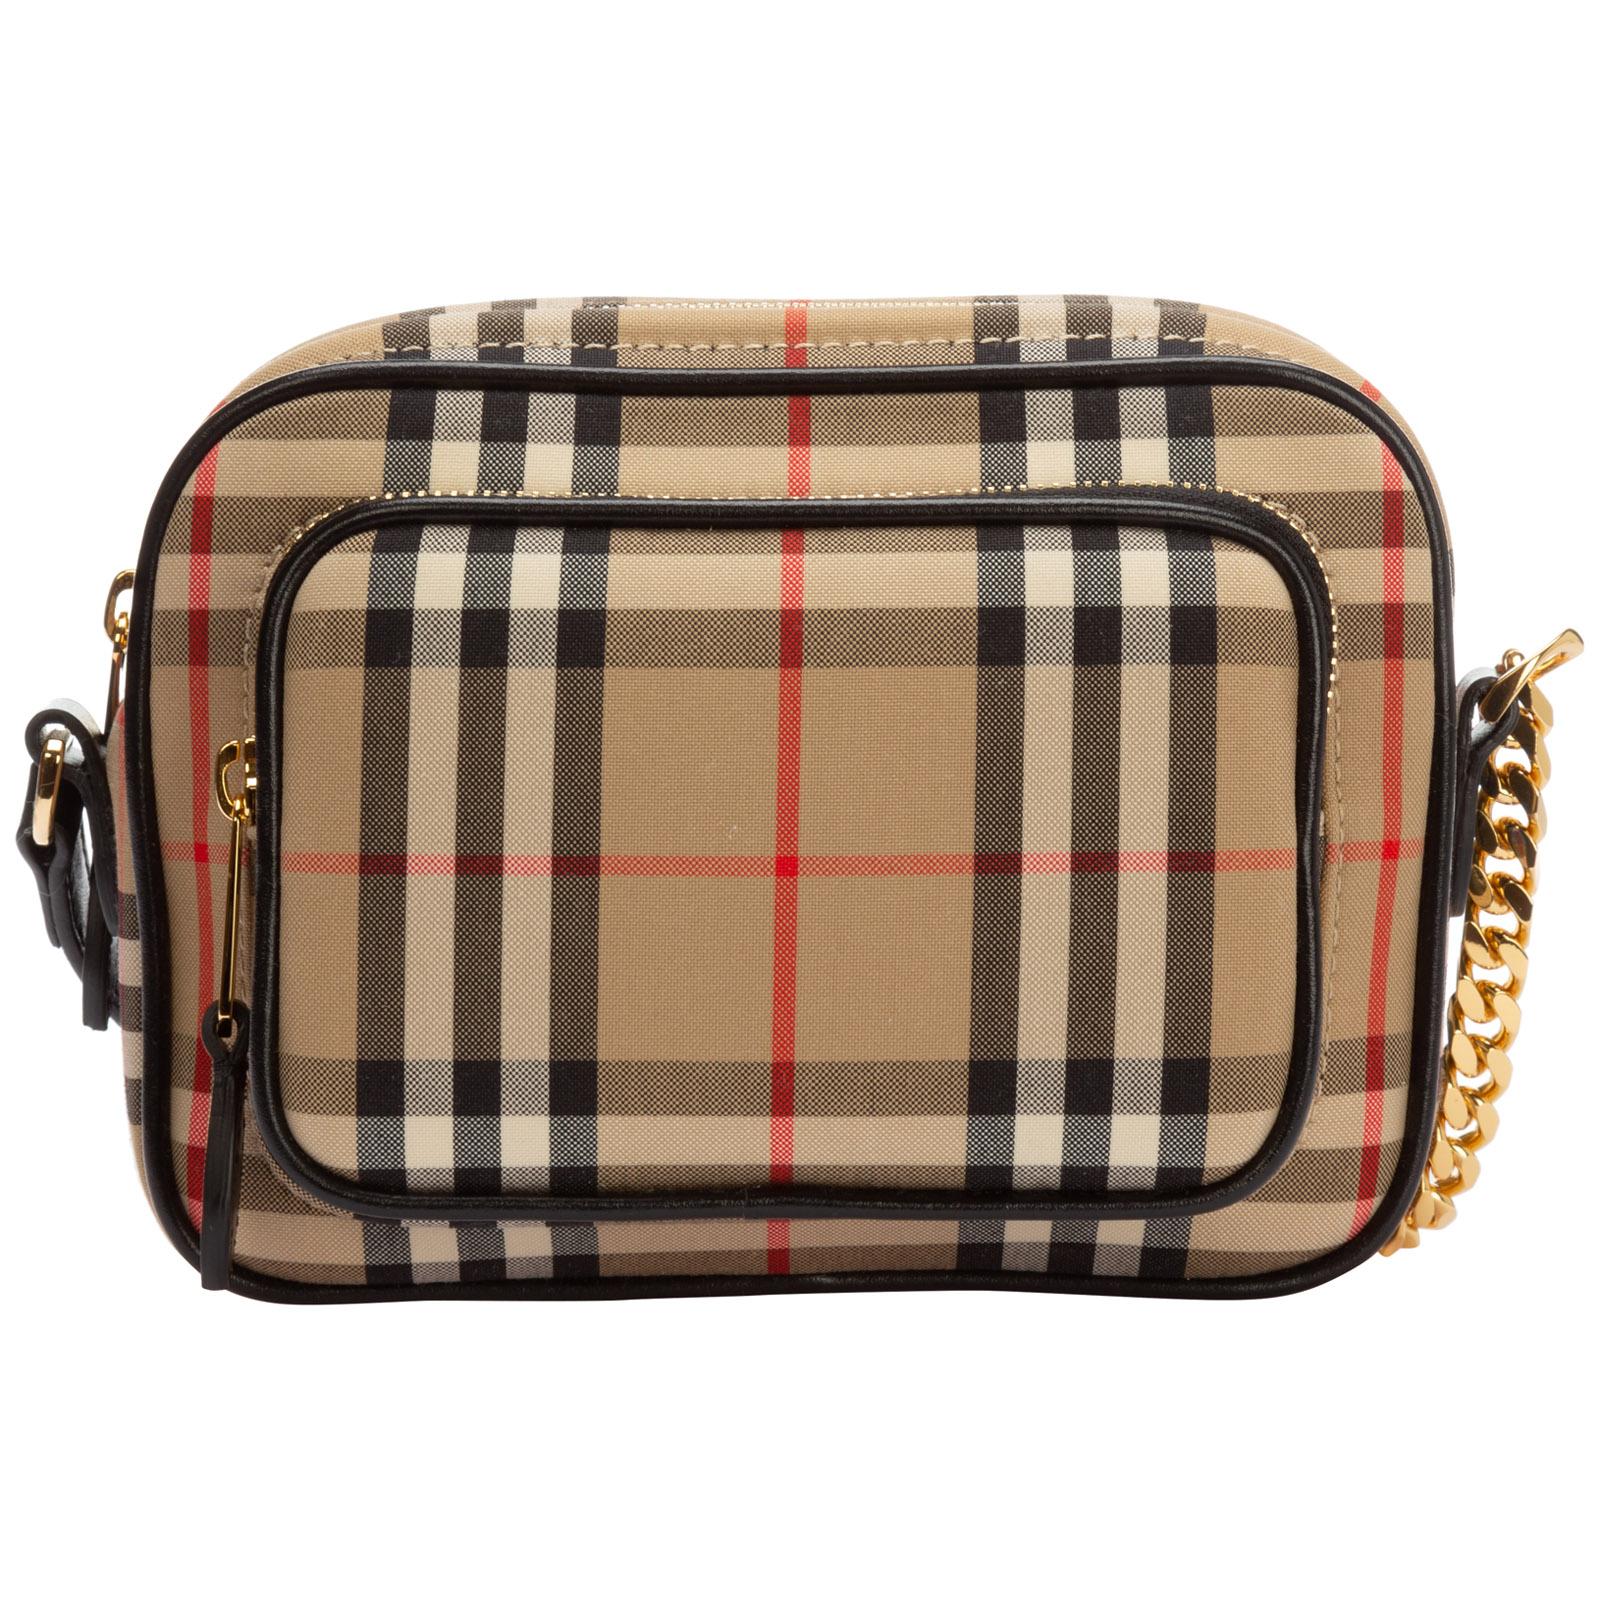 Burberry Shoulder bags WOMEN'S SHOULDER BAG  CAMERA